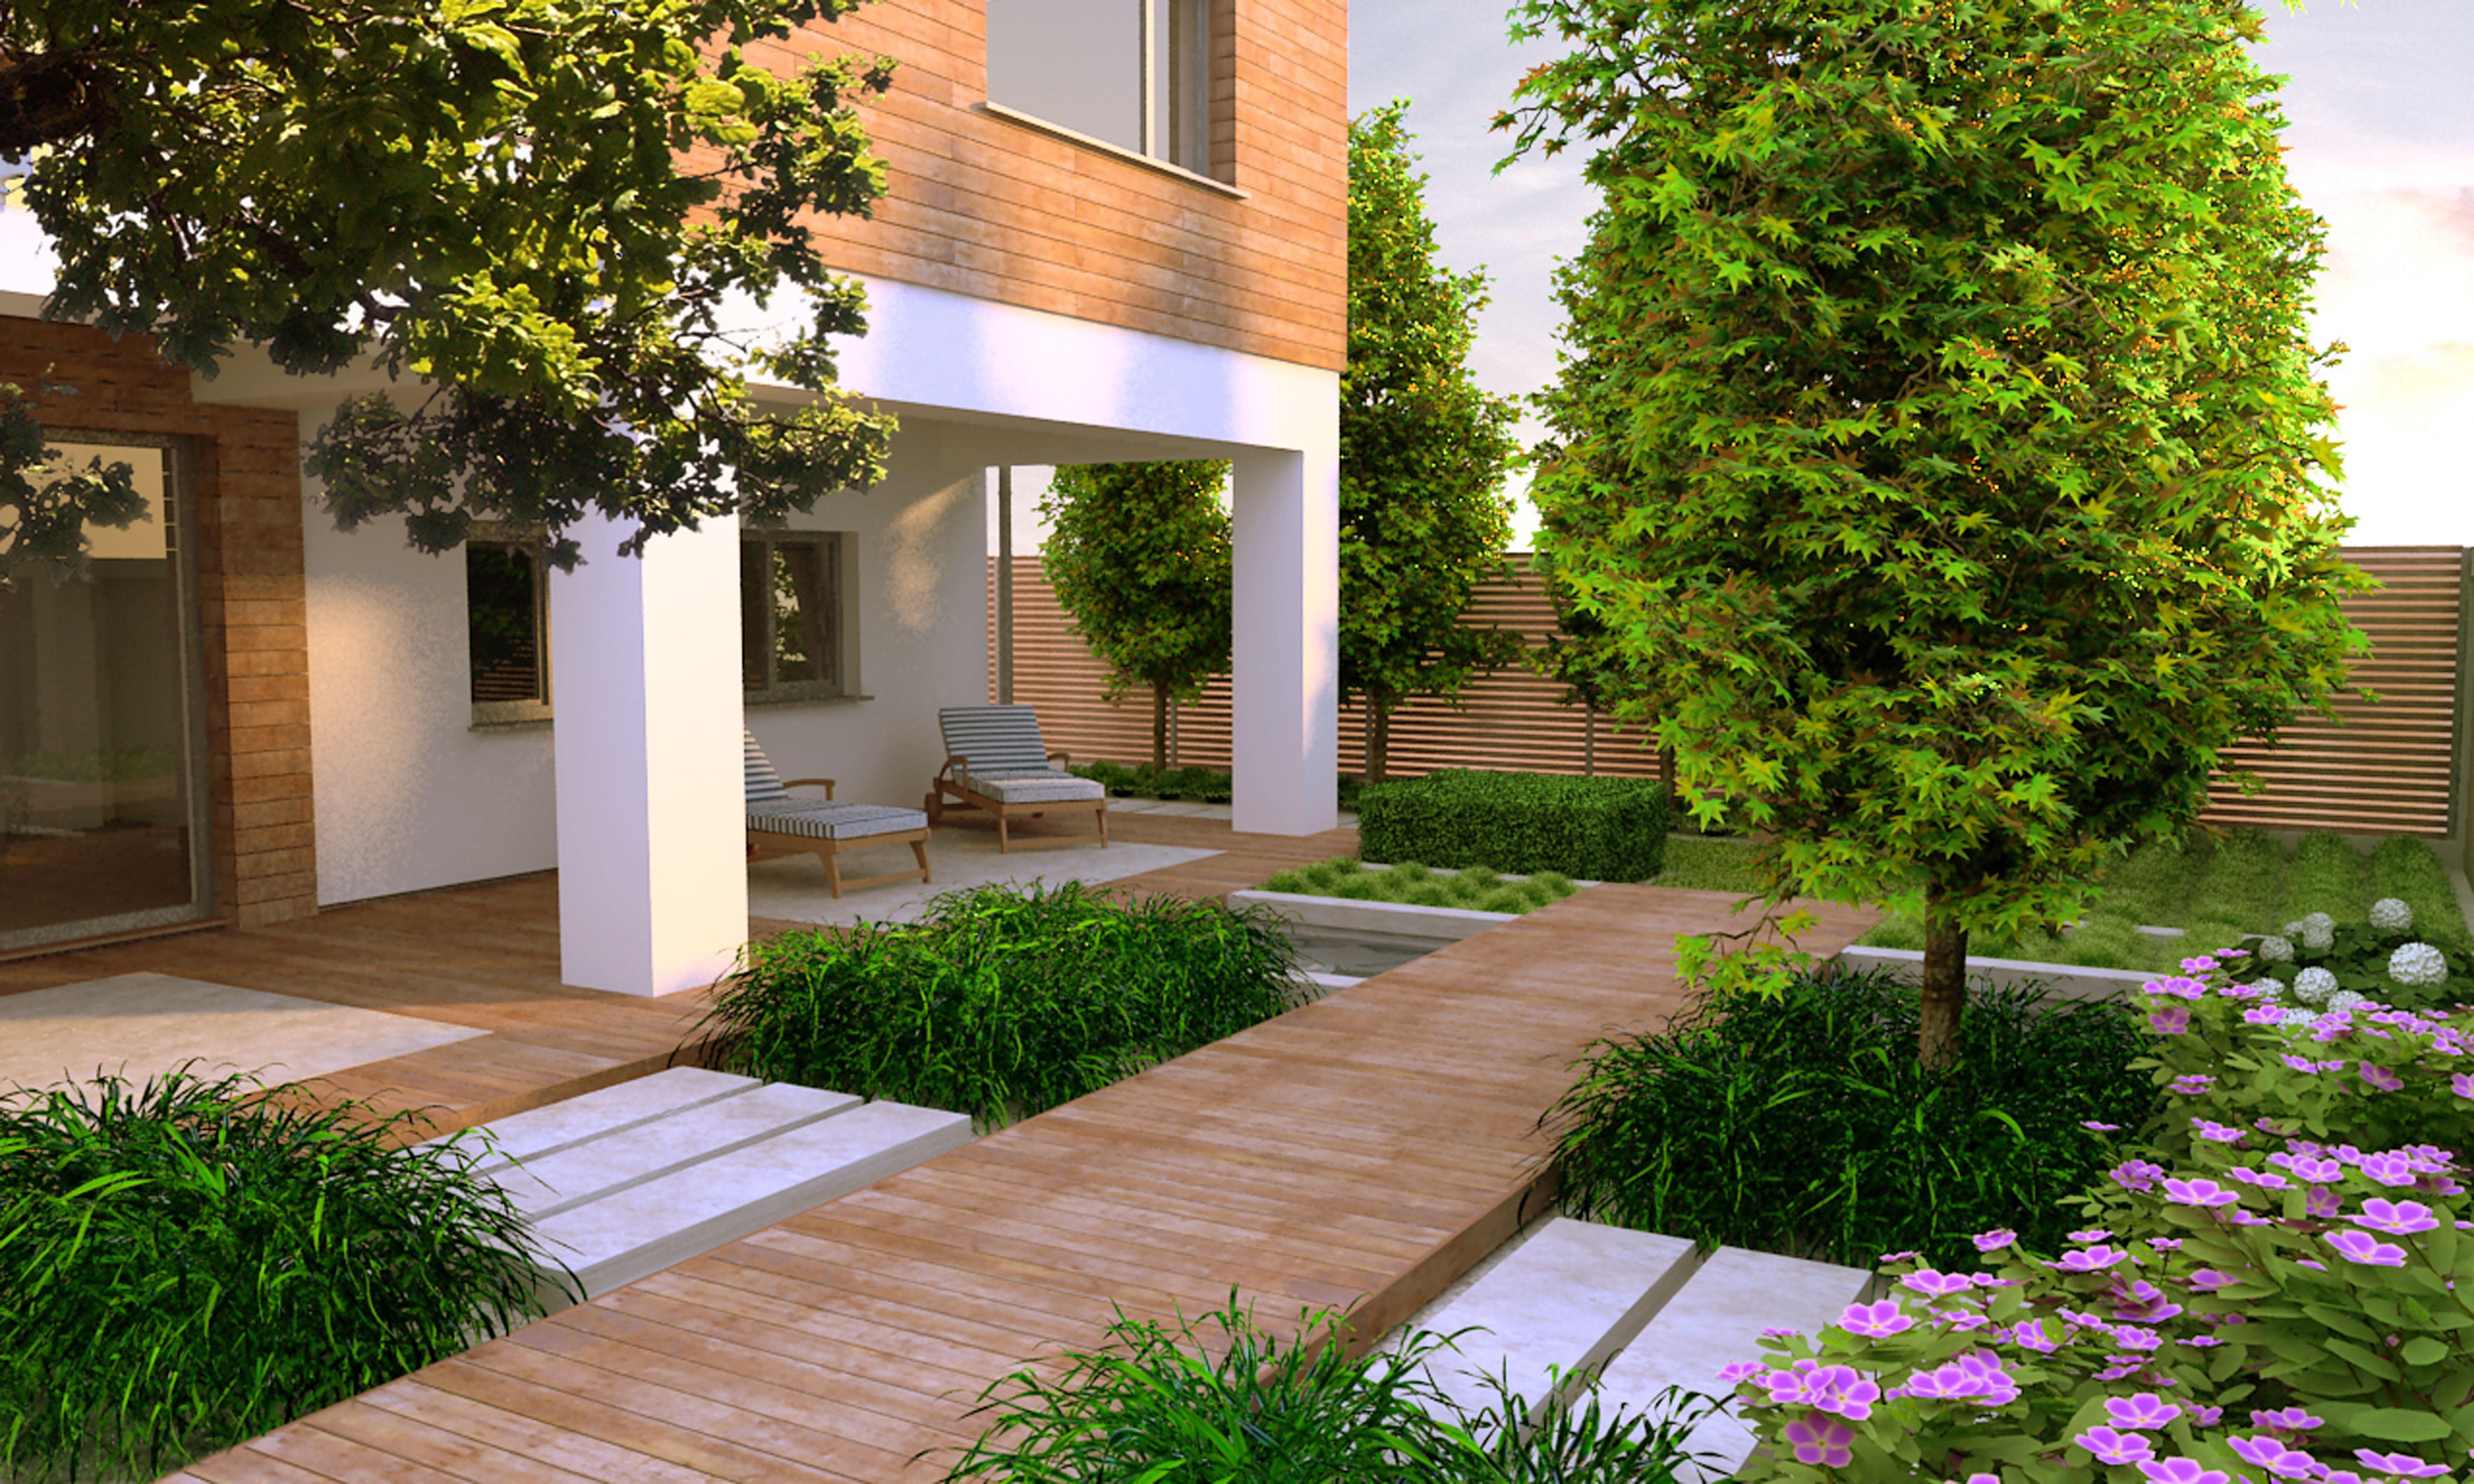 garden design ideas modern photo - 10